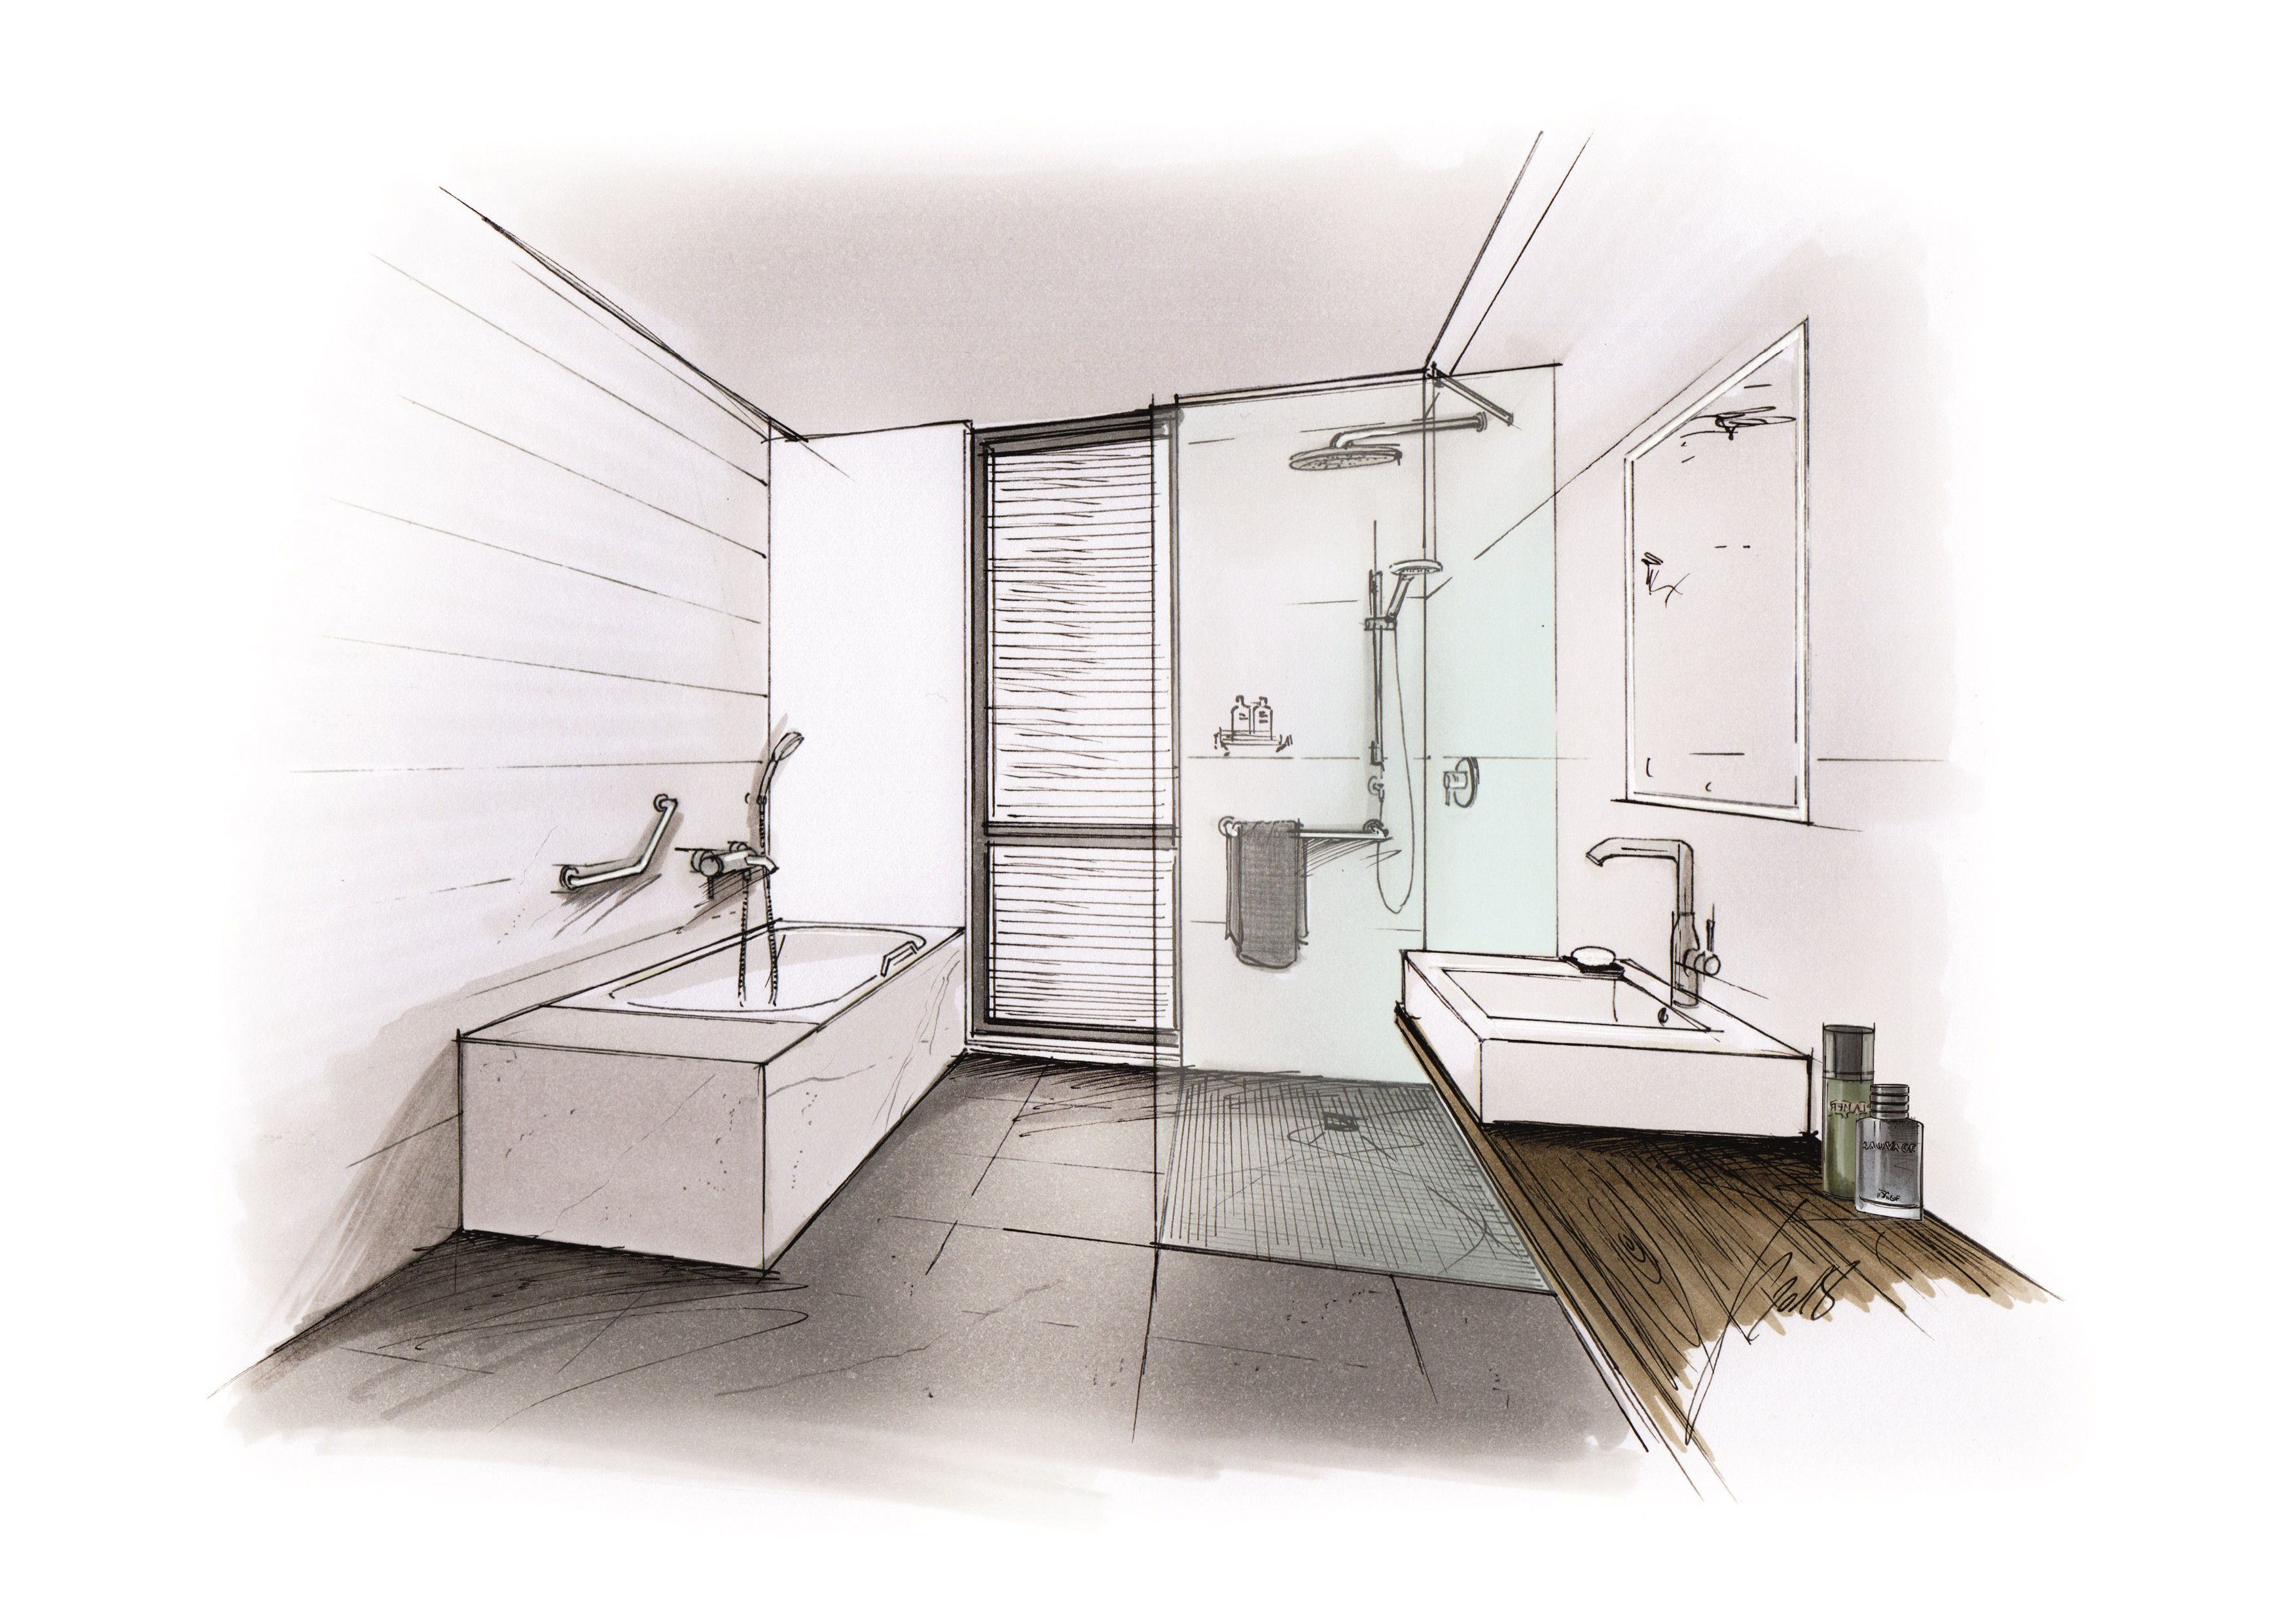 Barrierefreies Bad Tipps Ratgeber Zur Planung Obi Badewanne Bad Dusche Barrierefreies Obi Barrierefrei Badezimmer Fe In 2020 Bathroom Vanity Vanity Double Vanity